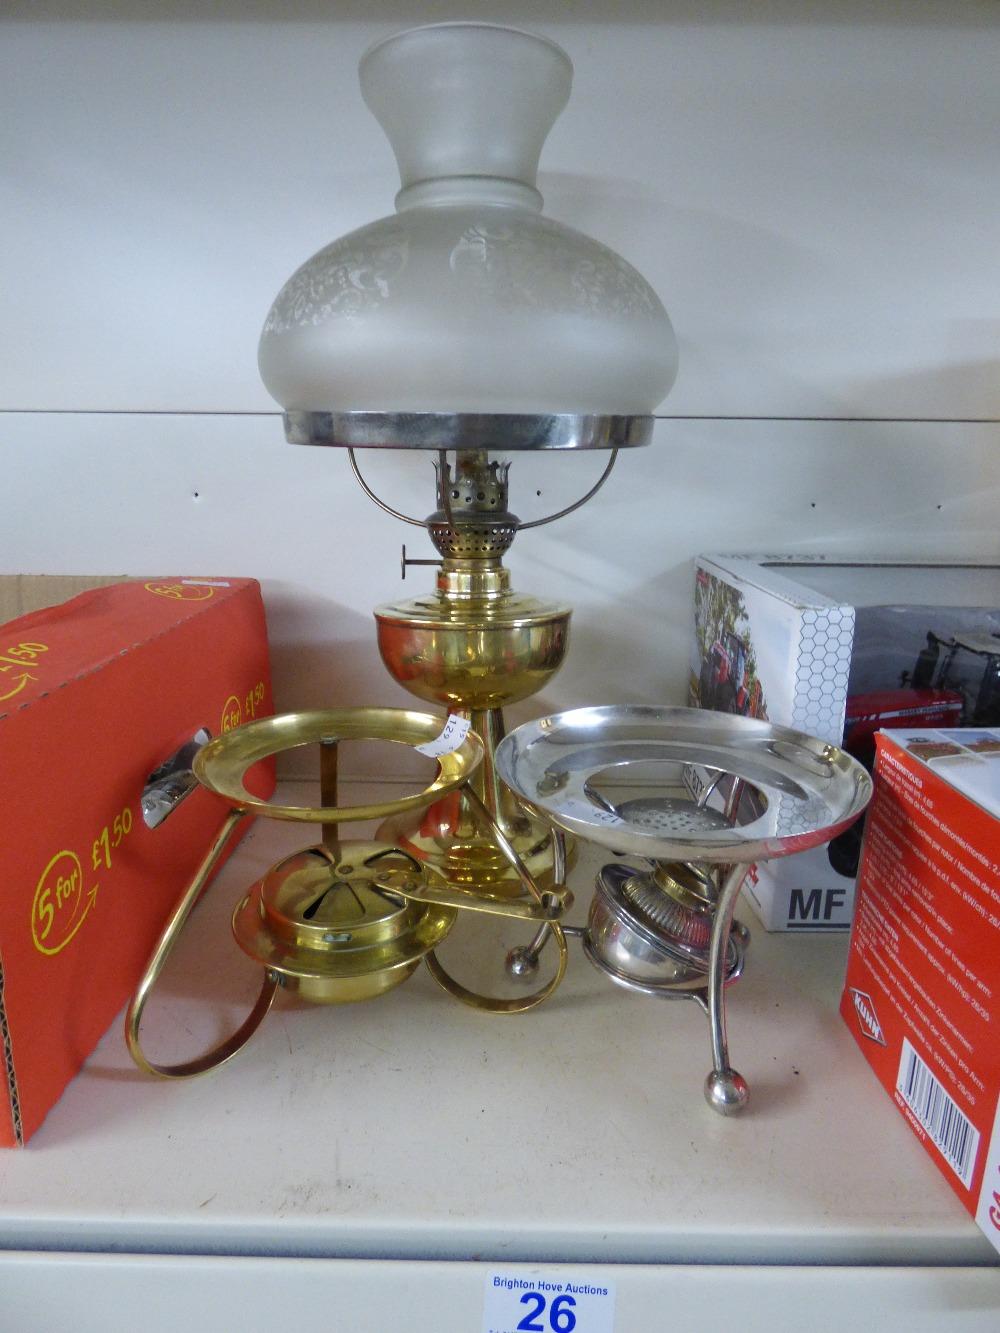 Lot 26 - 2 X SPIRIT BURNERS & 1 X OIL LAMP